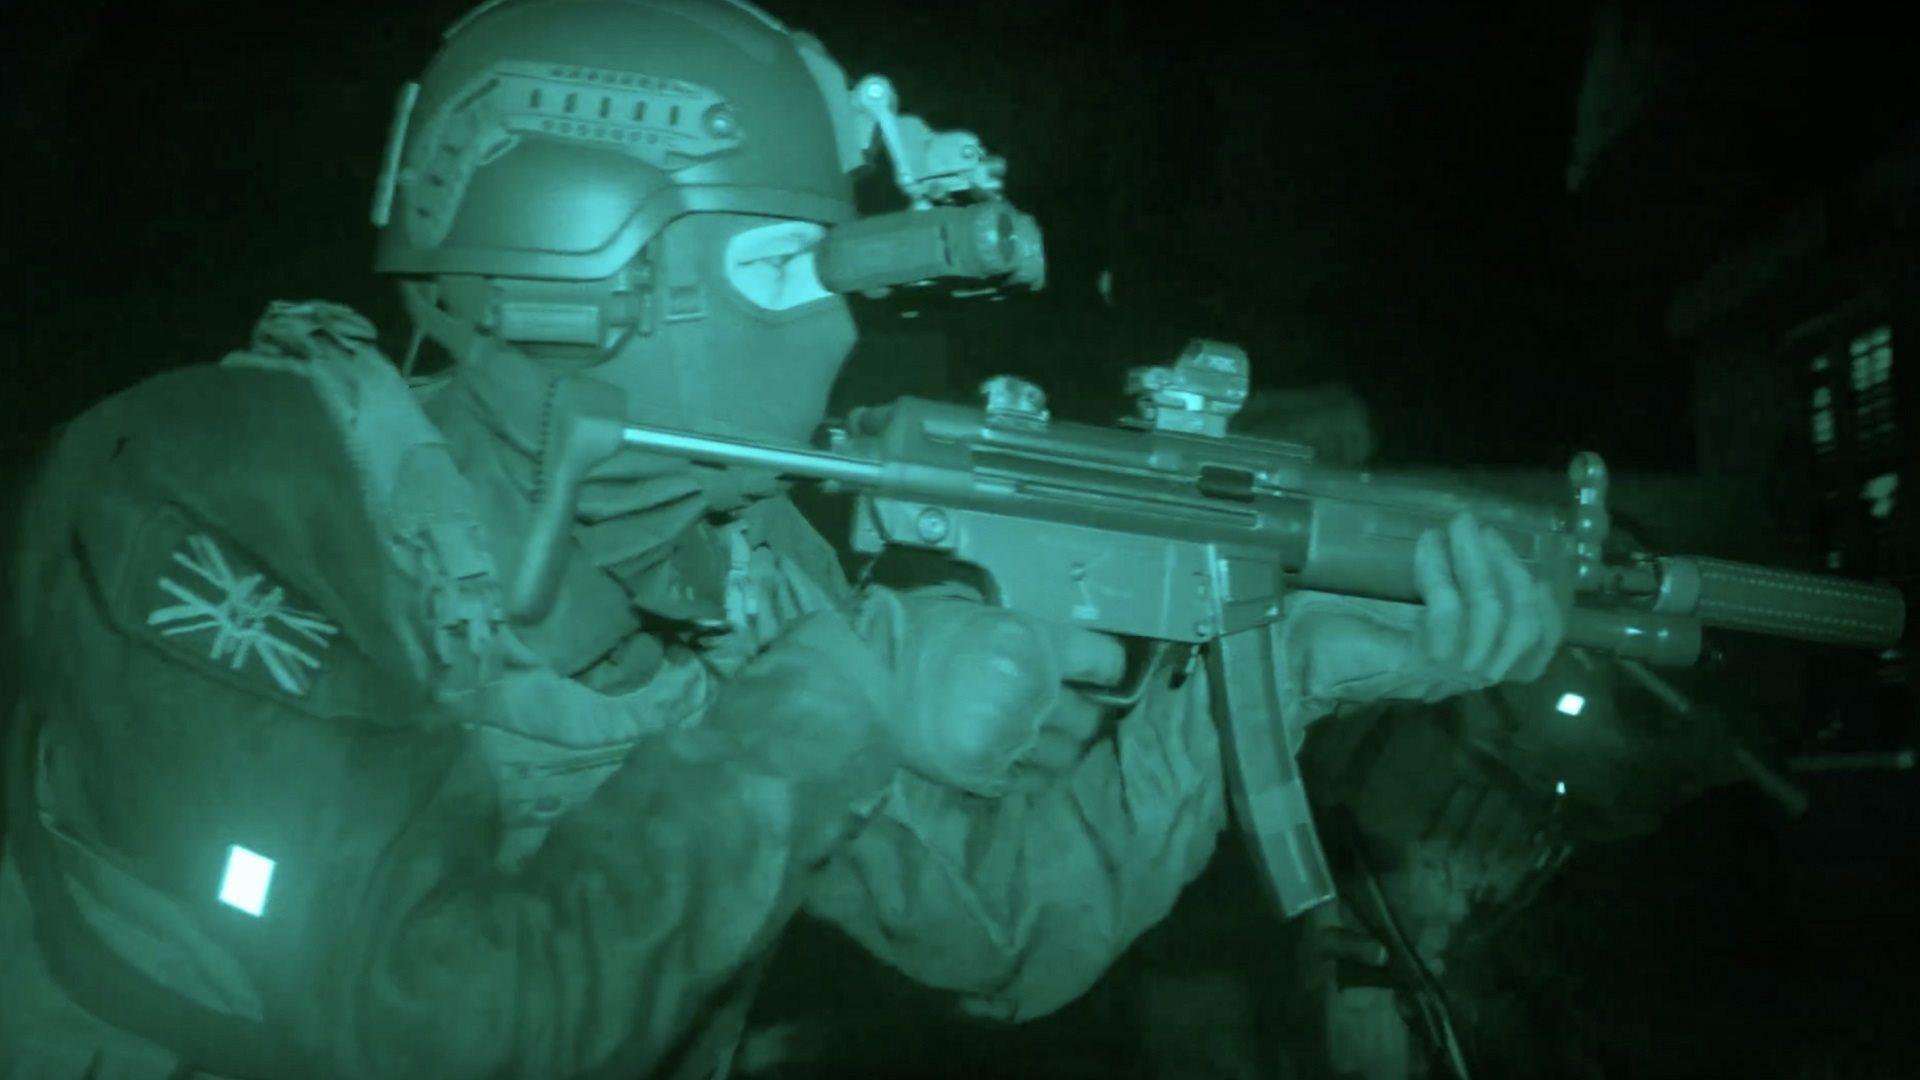 Call of Duty: Modern Warfare; gameplay: going dark